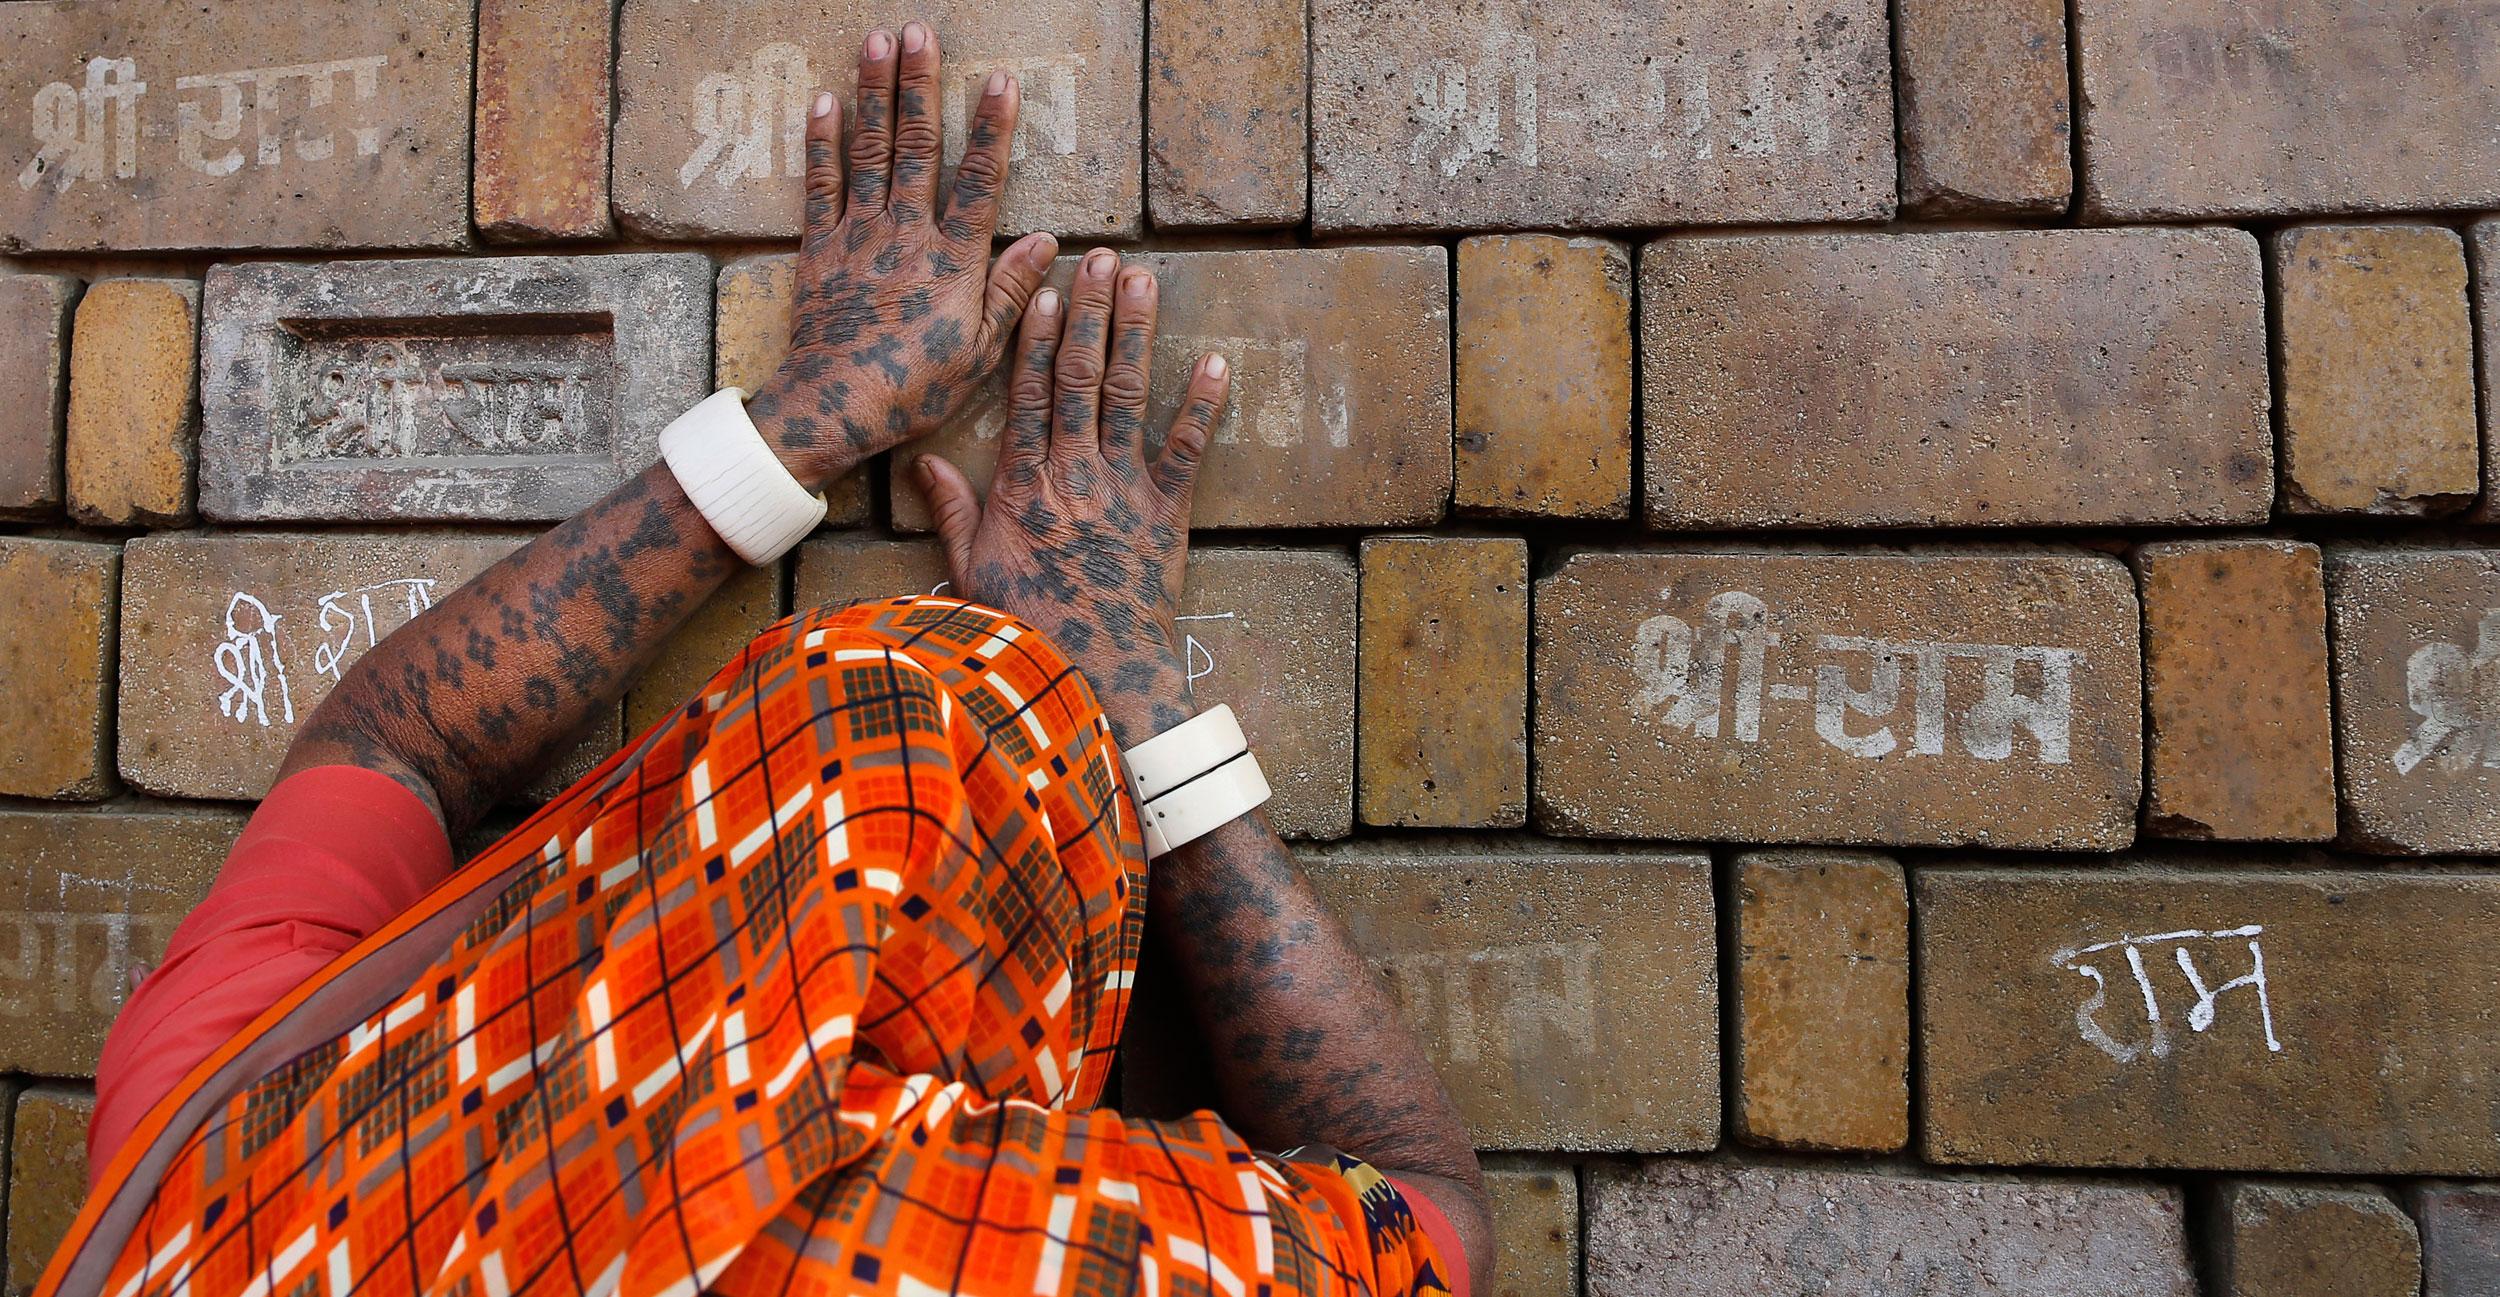 A Hindu devotee prays to the bricks reading